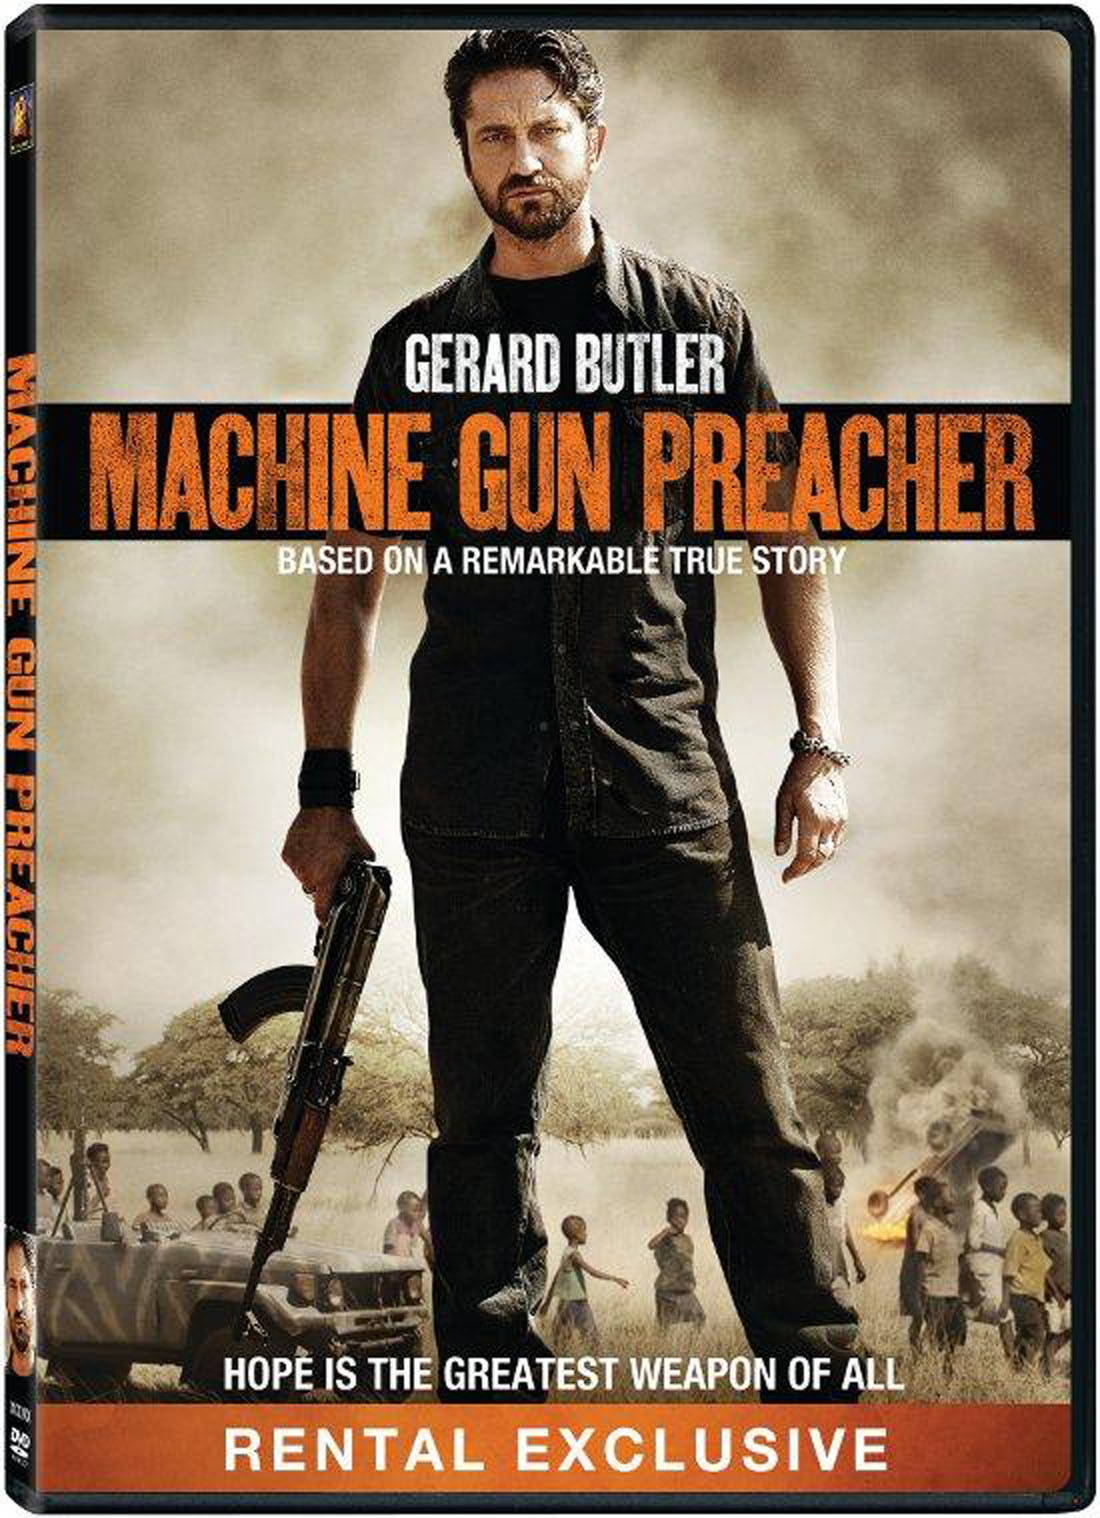 Machine Gun Preacher DVD Case Box